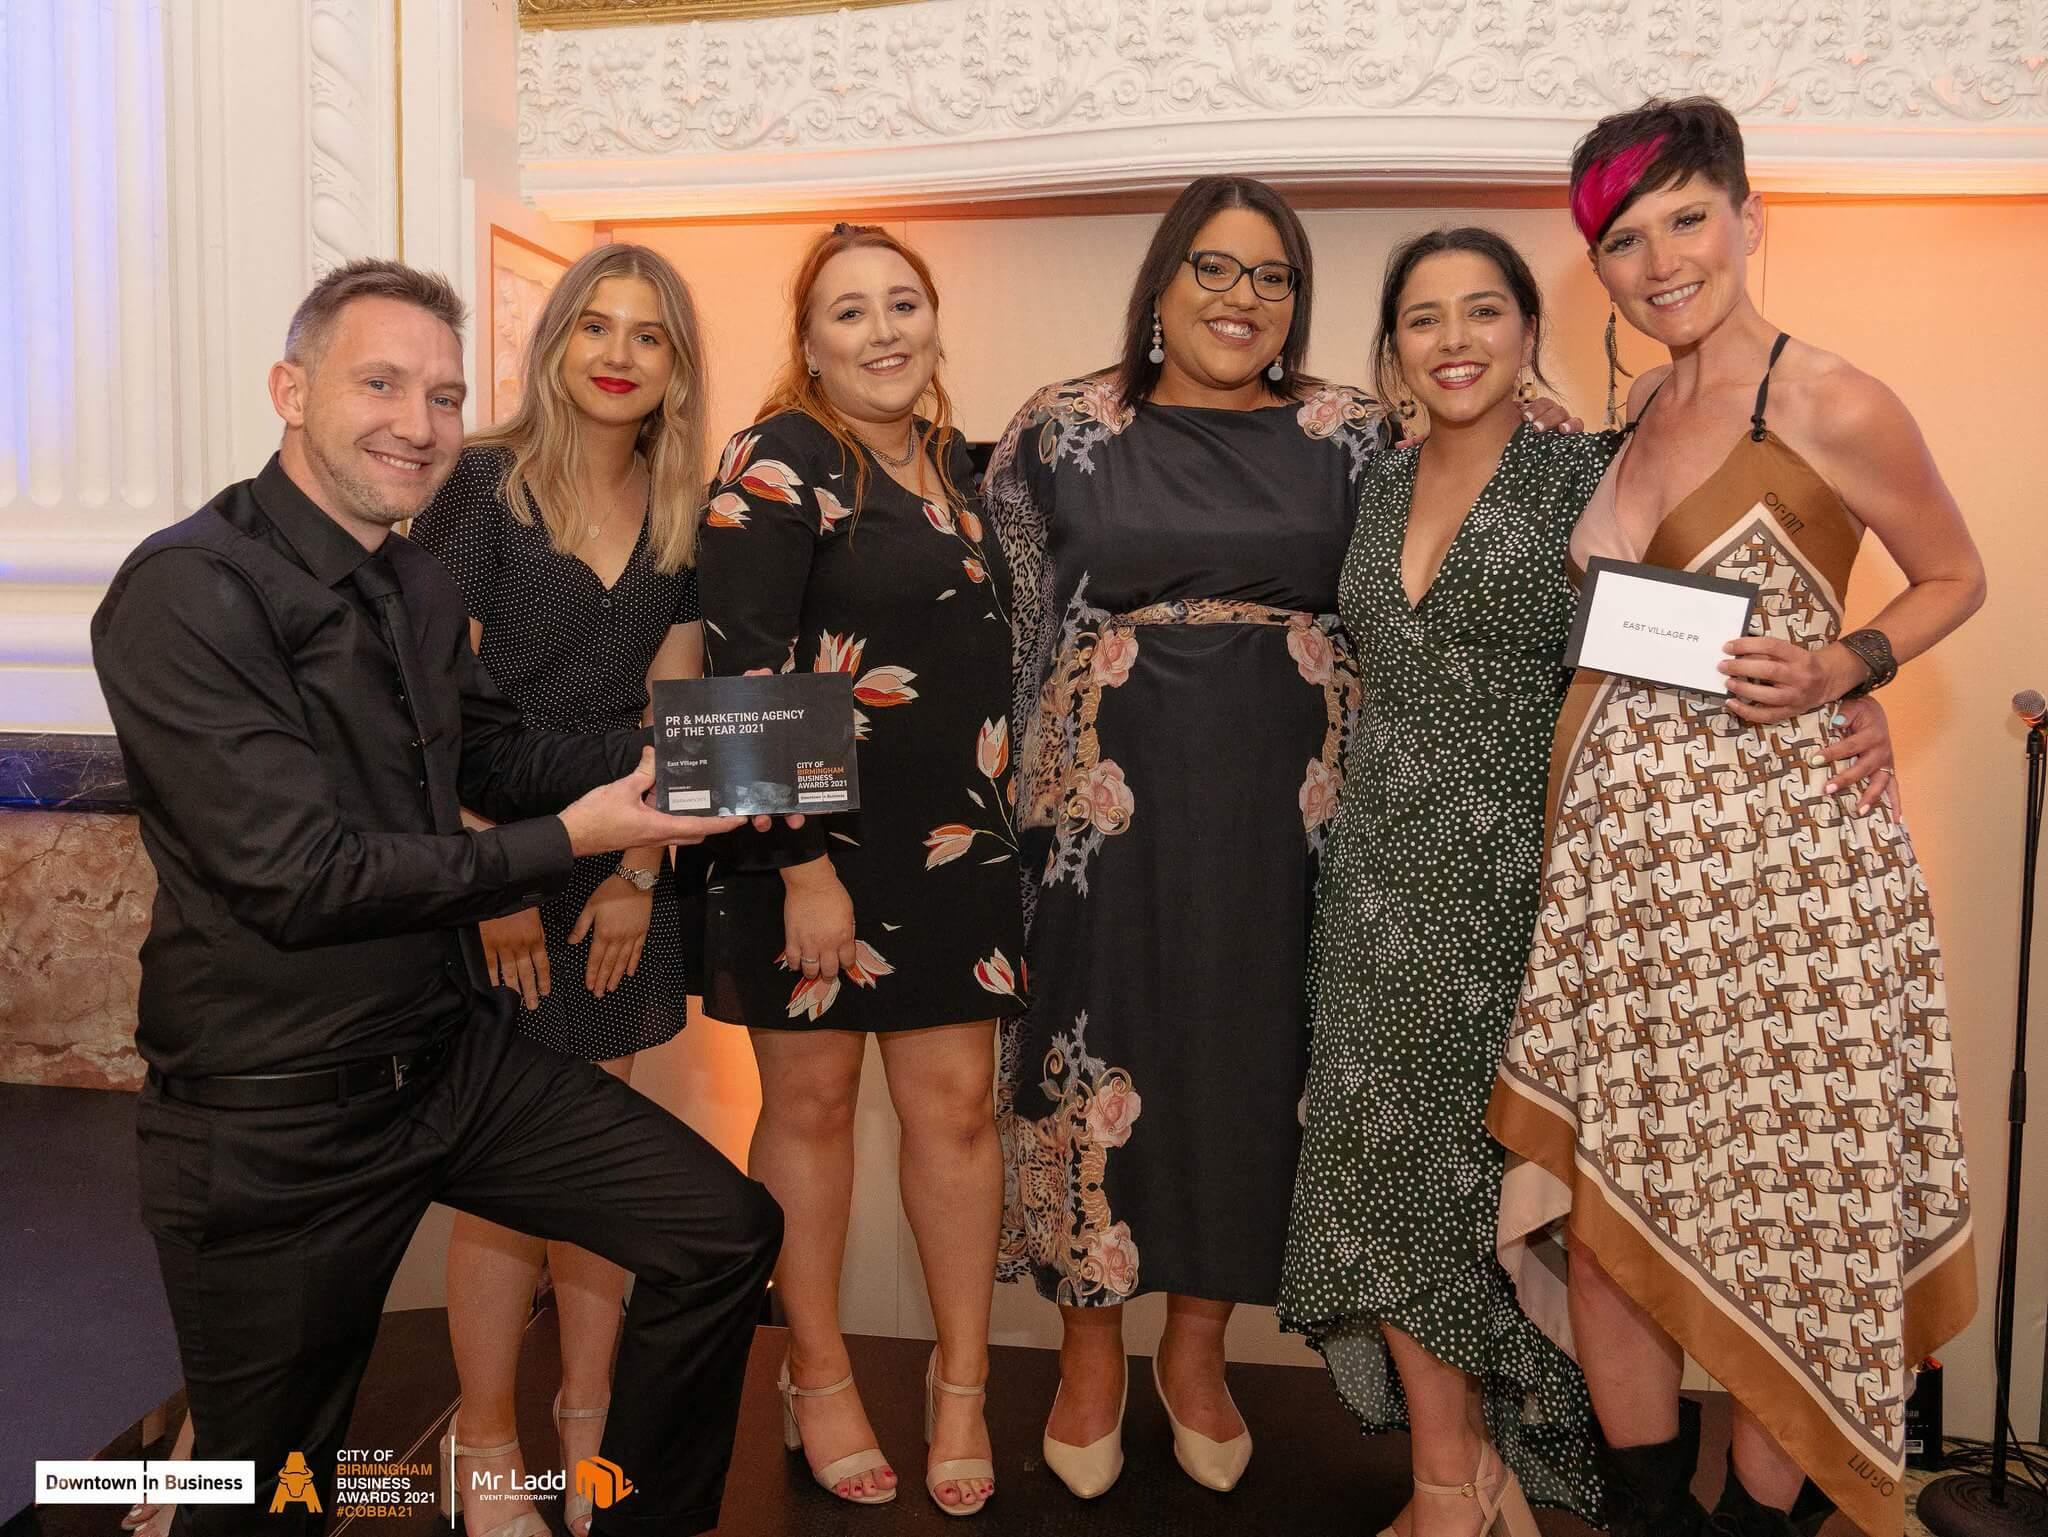 City of Birmingham Business Awards